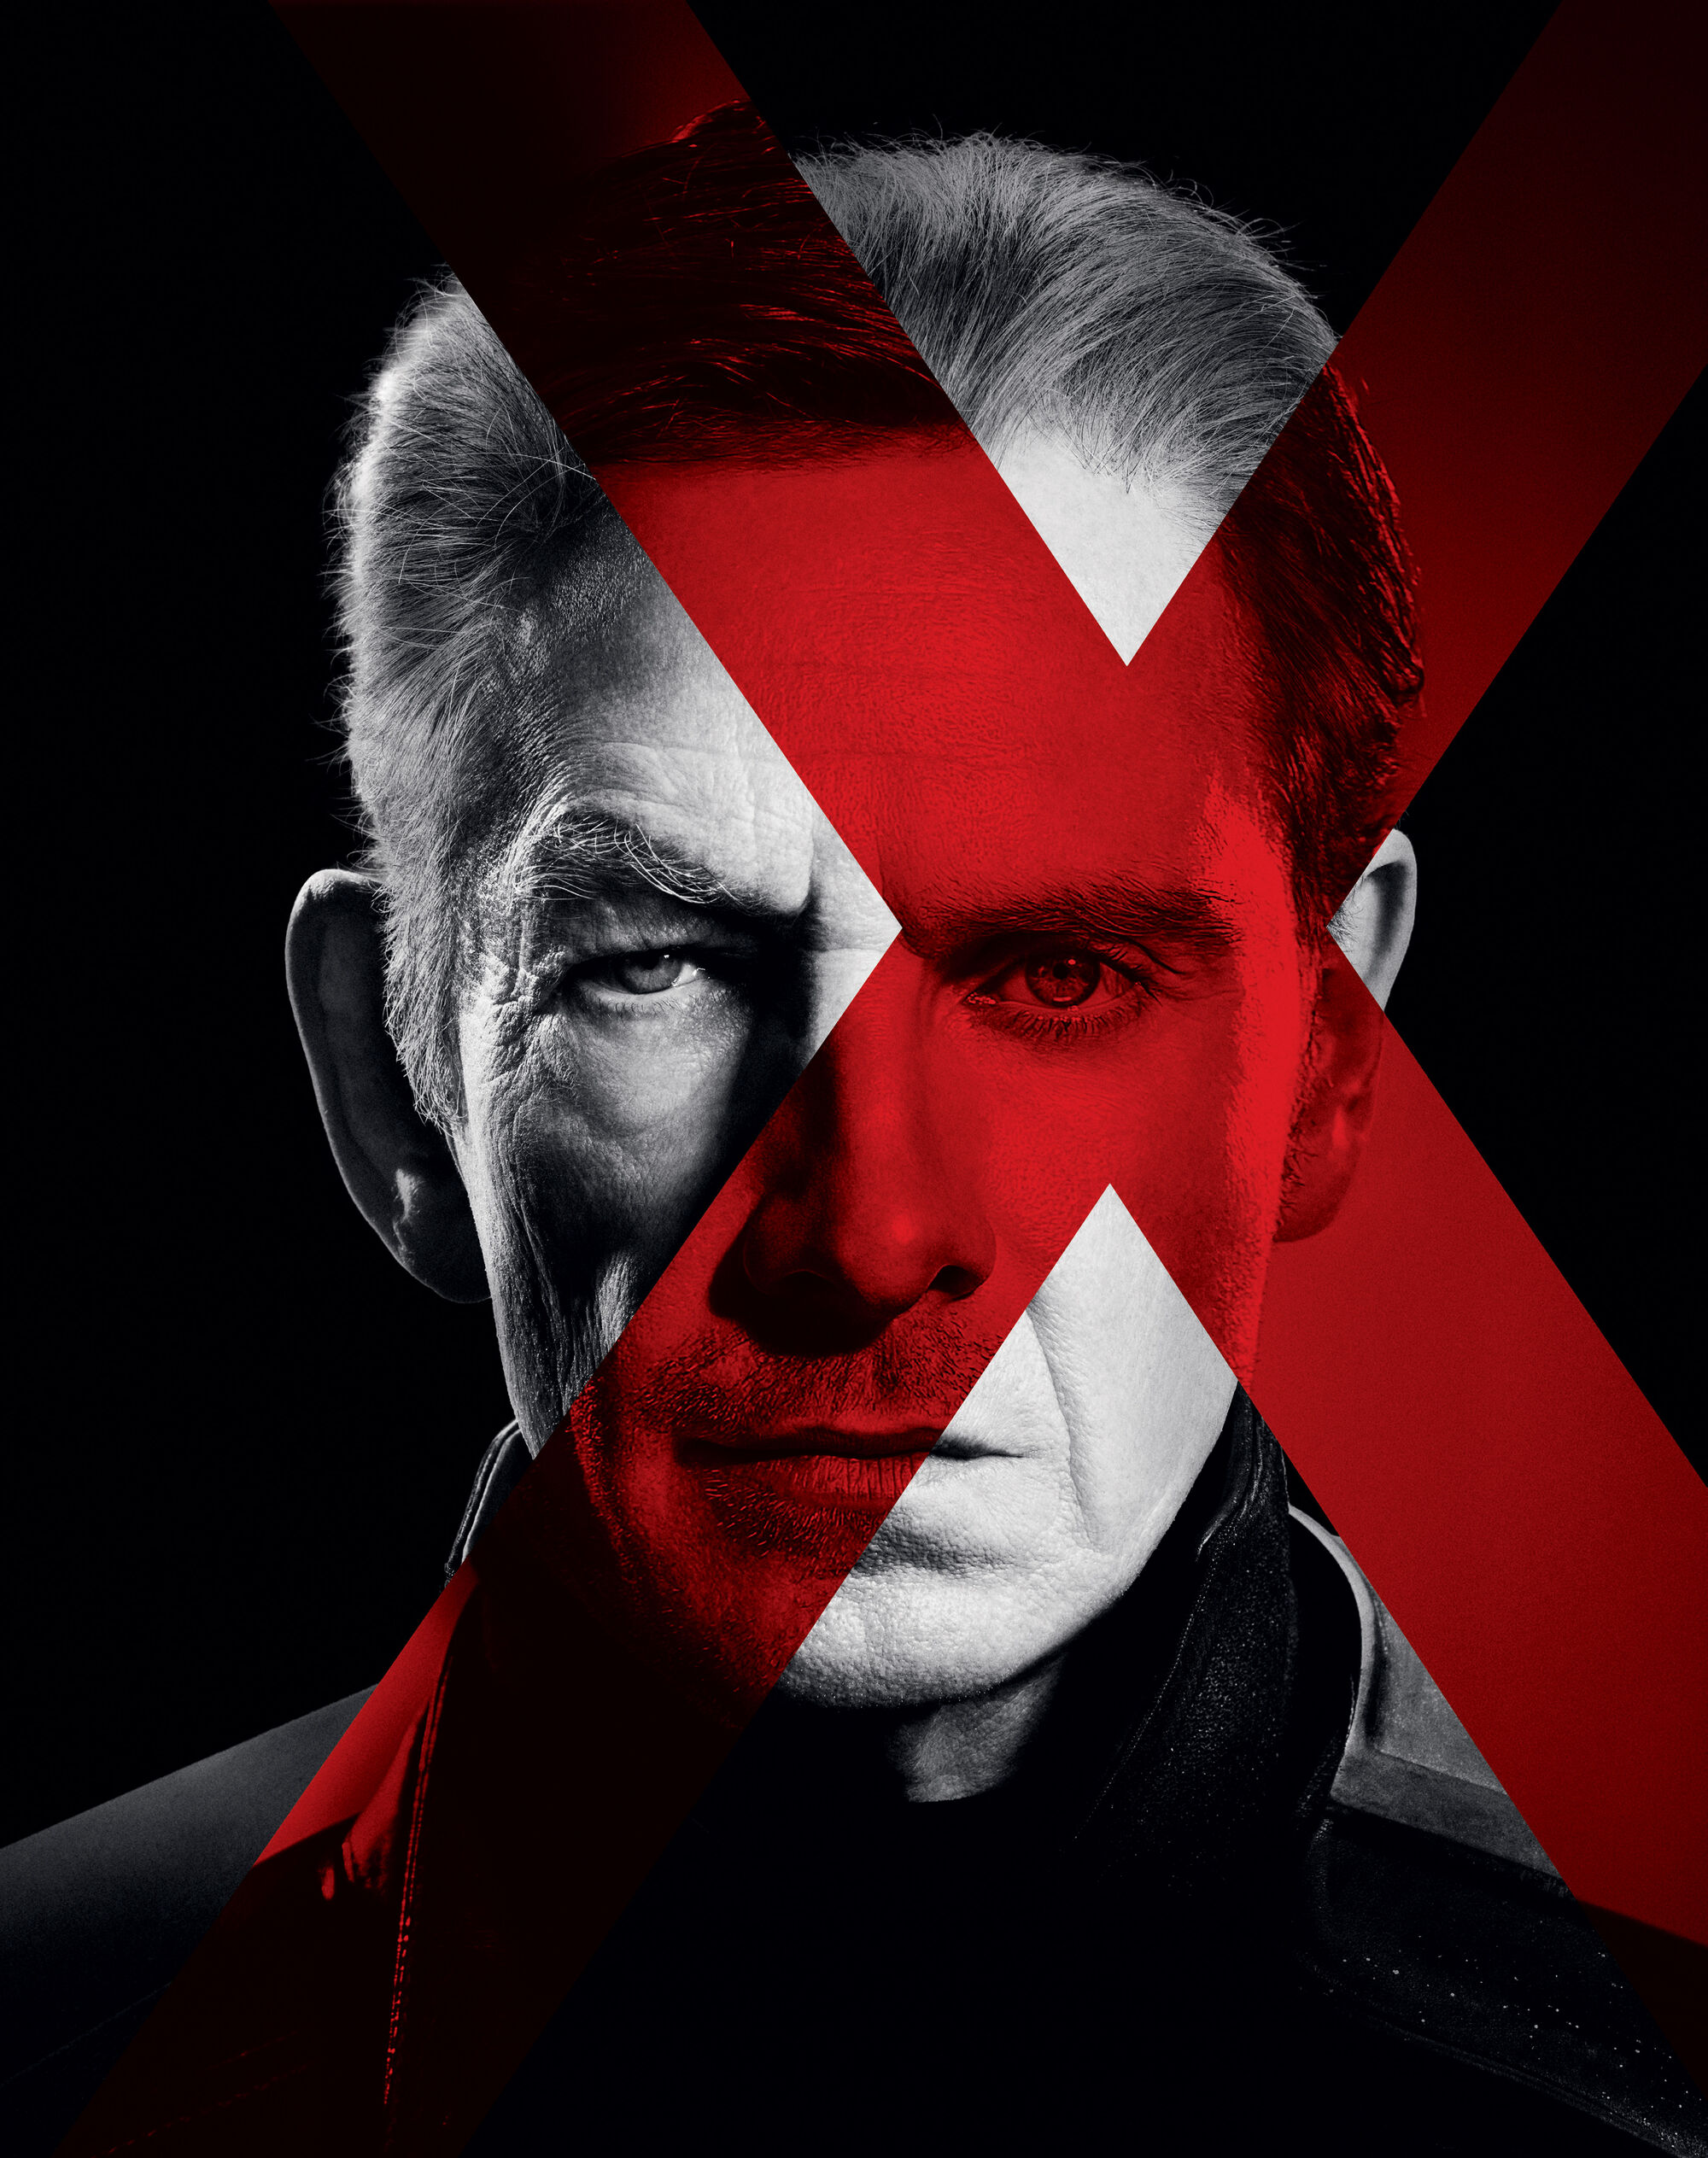 X Men First Class Magneto And Mystique Magneto - X-Men...